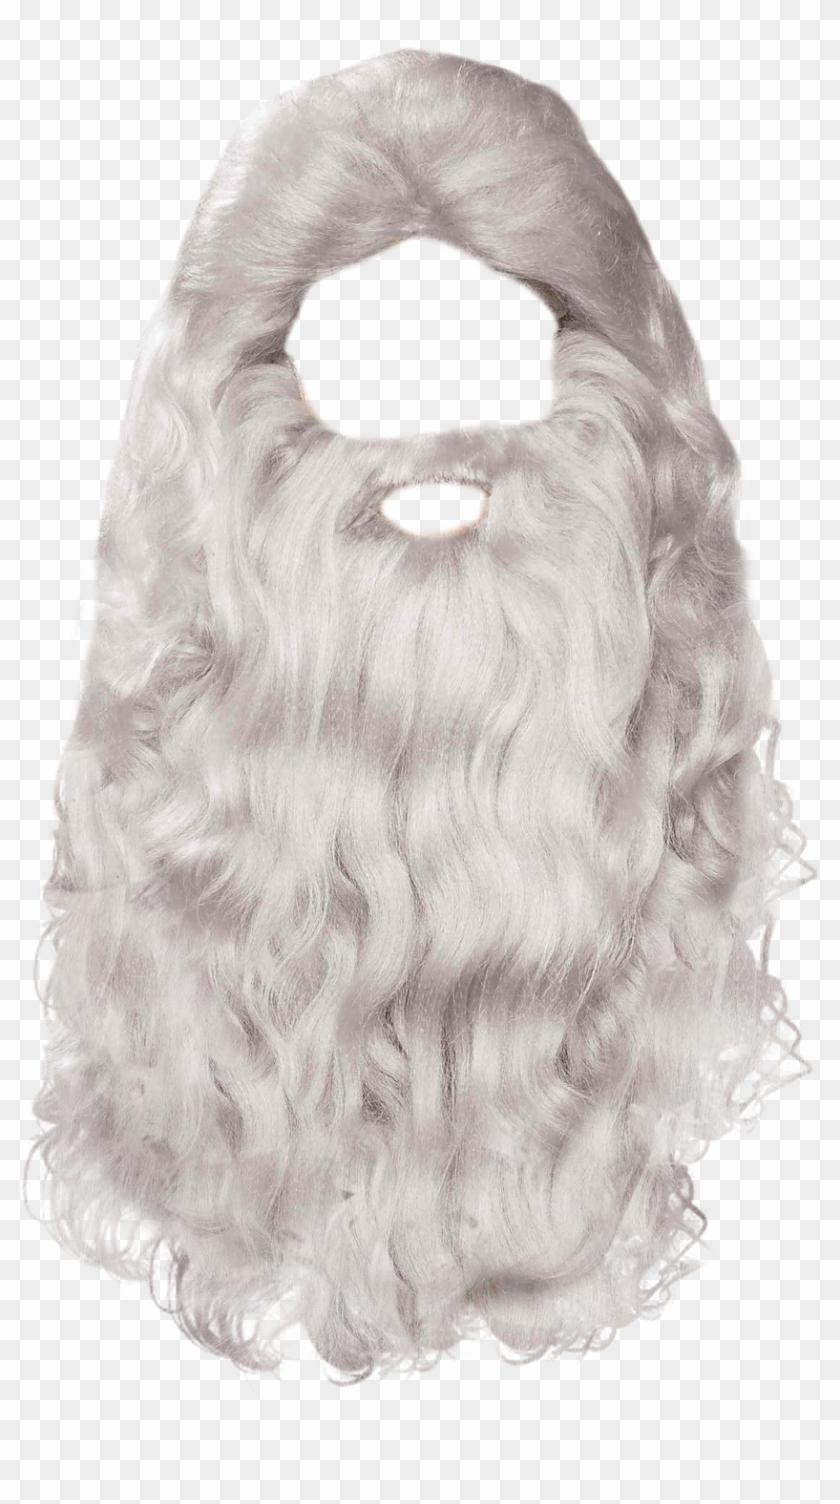 60e7ddb95 Beard Png Transparent Image - Transparent Santa Beard Png, Png Download